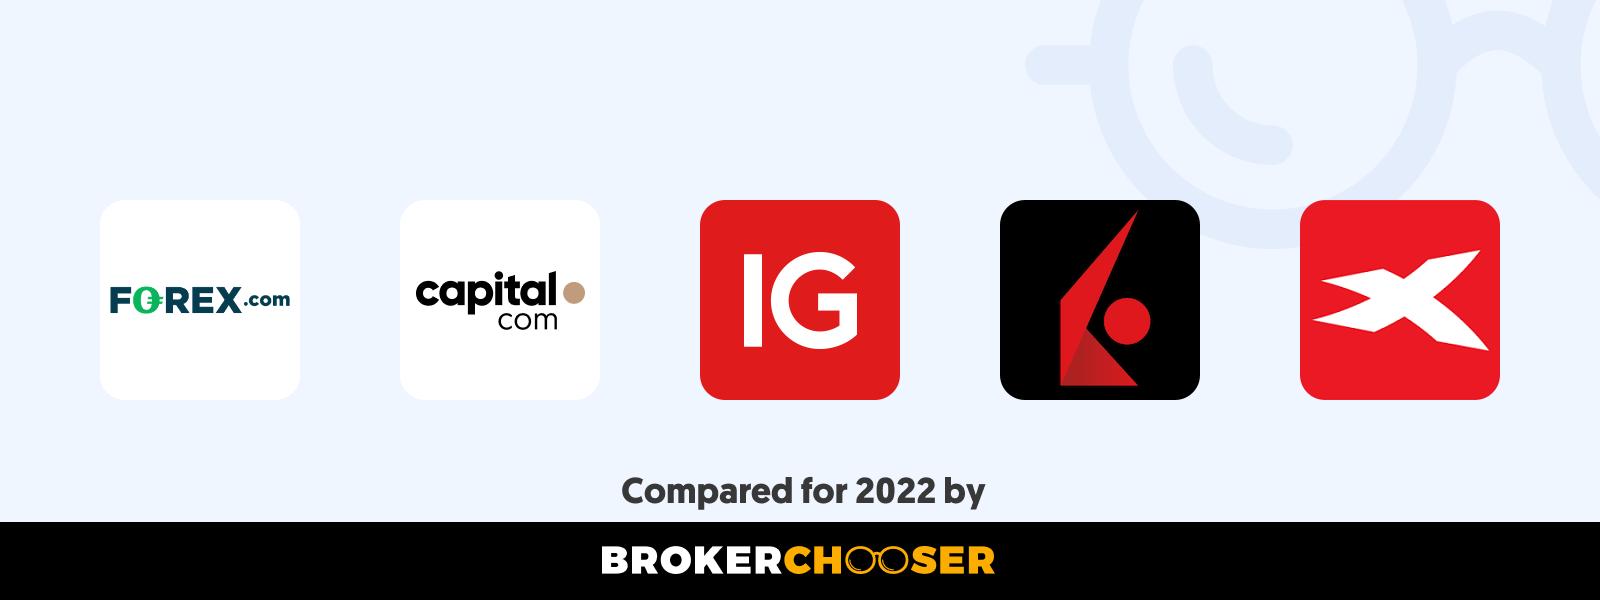 Best forex brokers for beginners in Rwanda in 2021